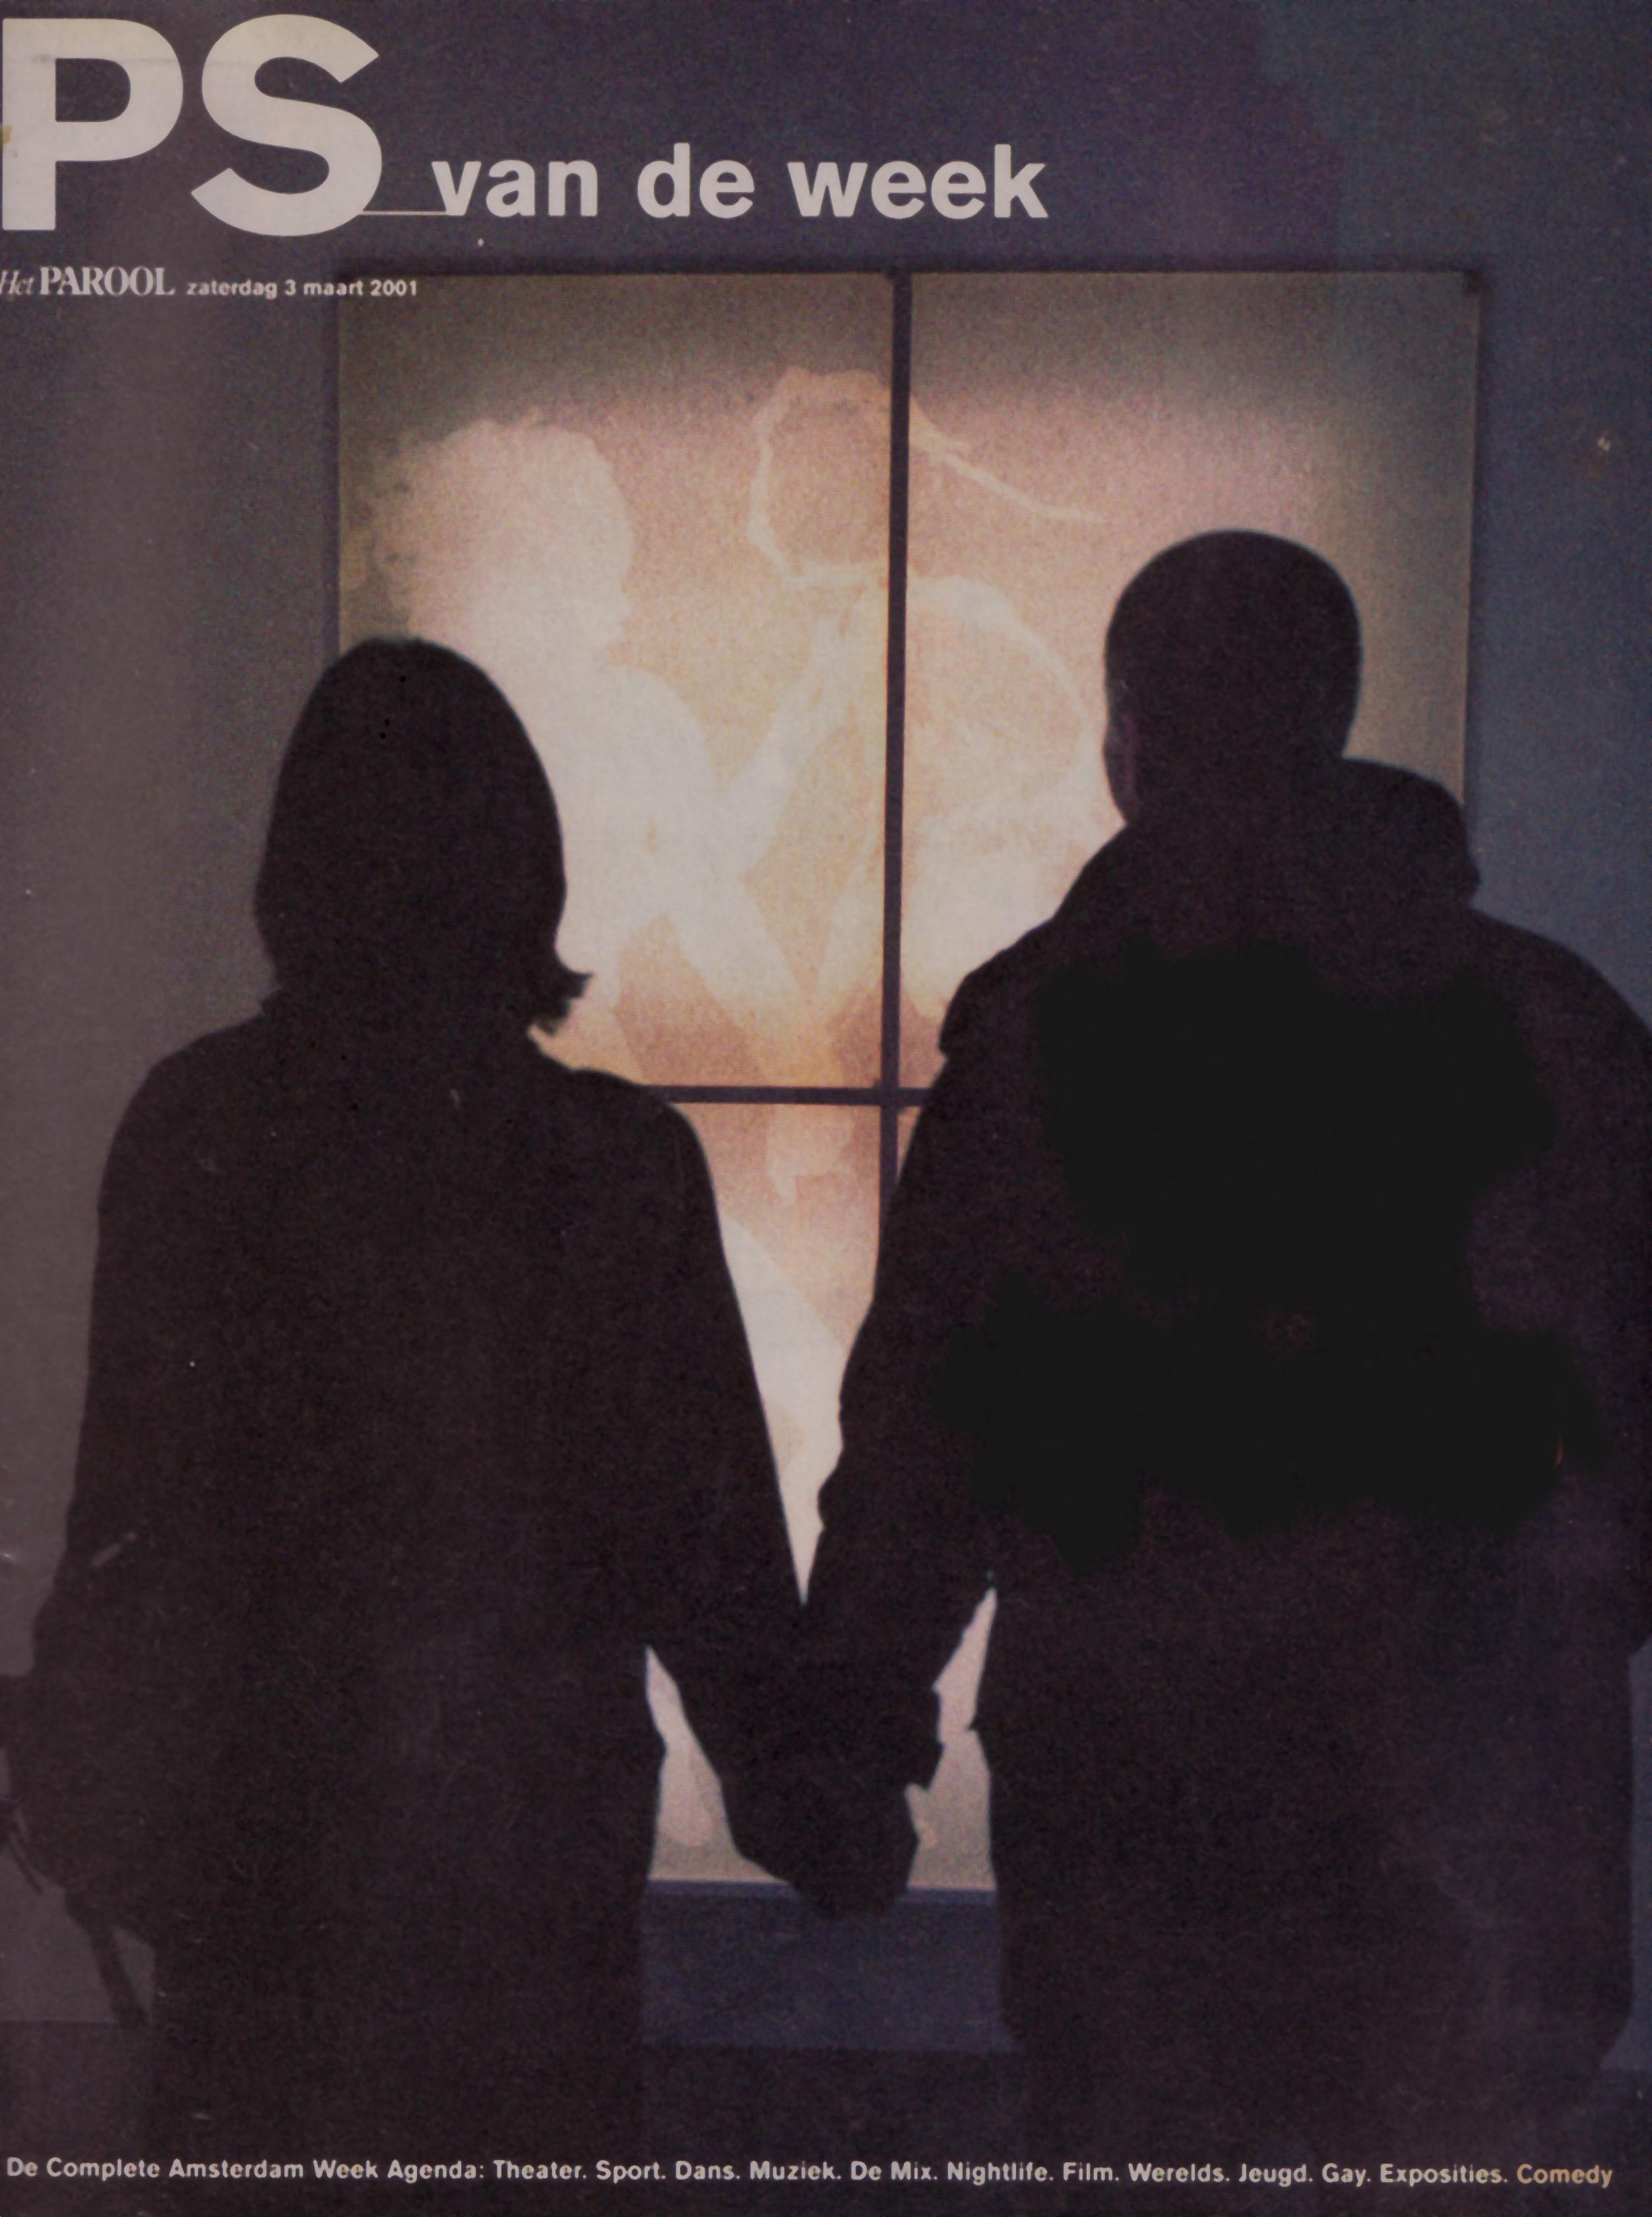 Naamloos-gescand-01 kopie 2